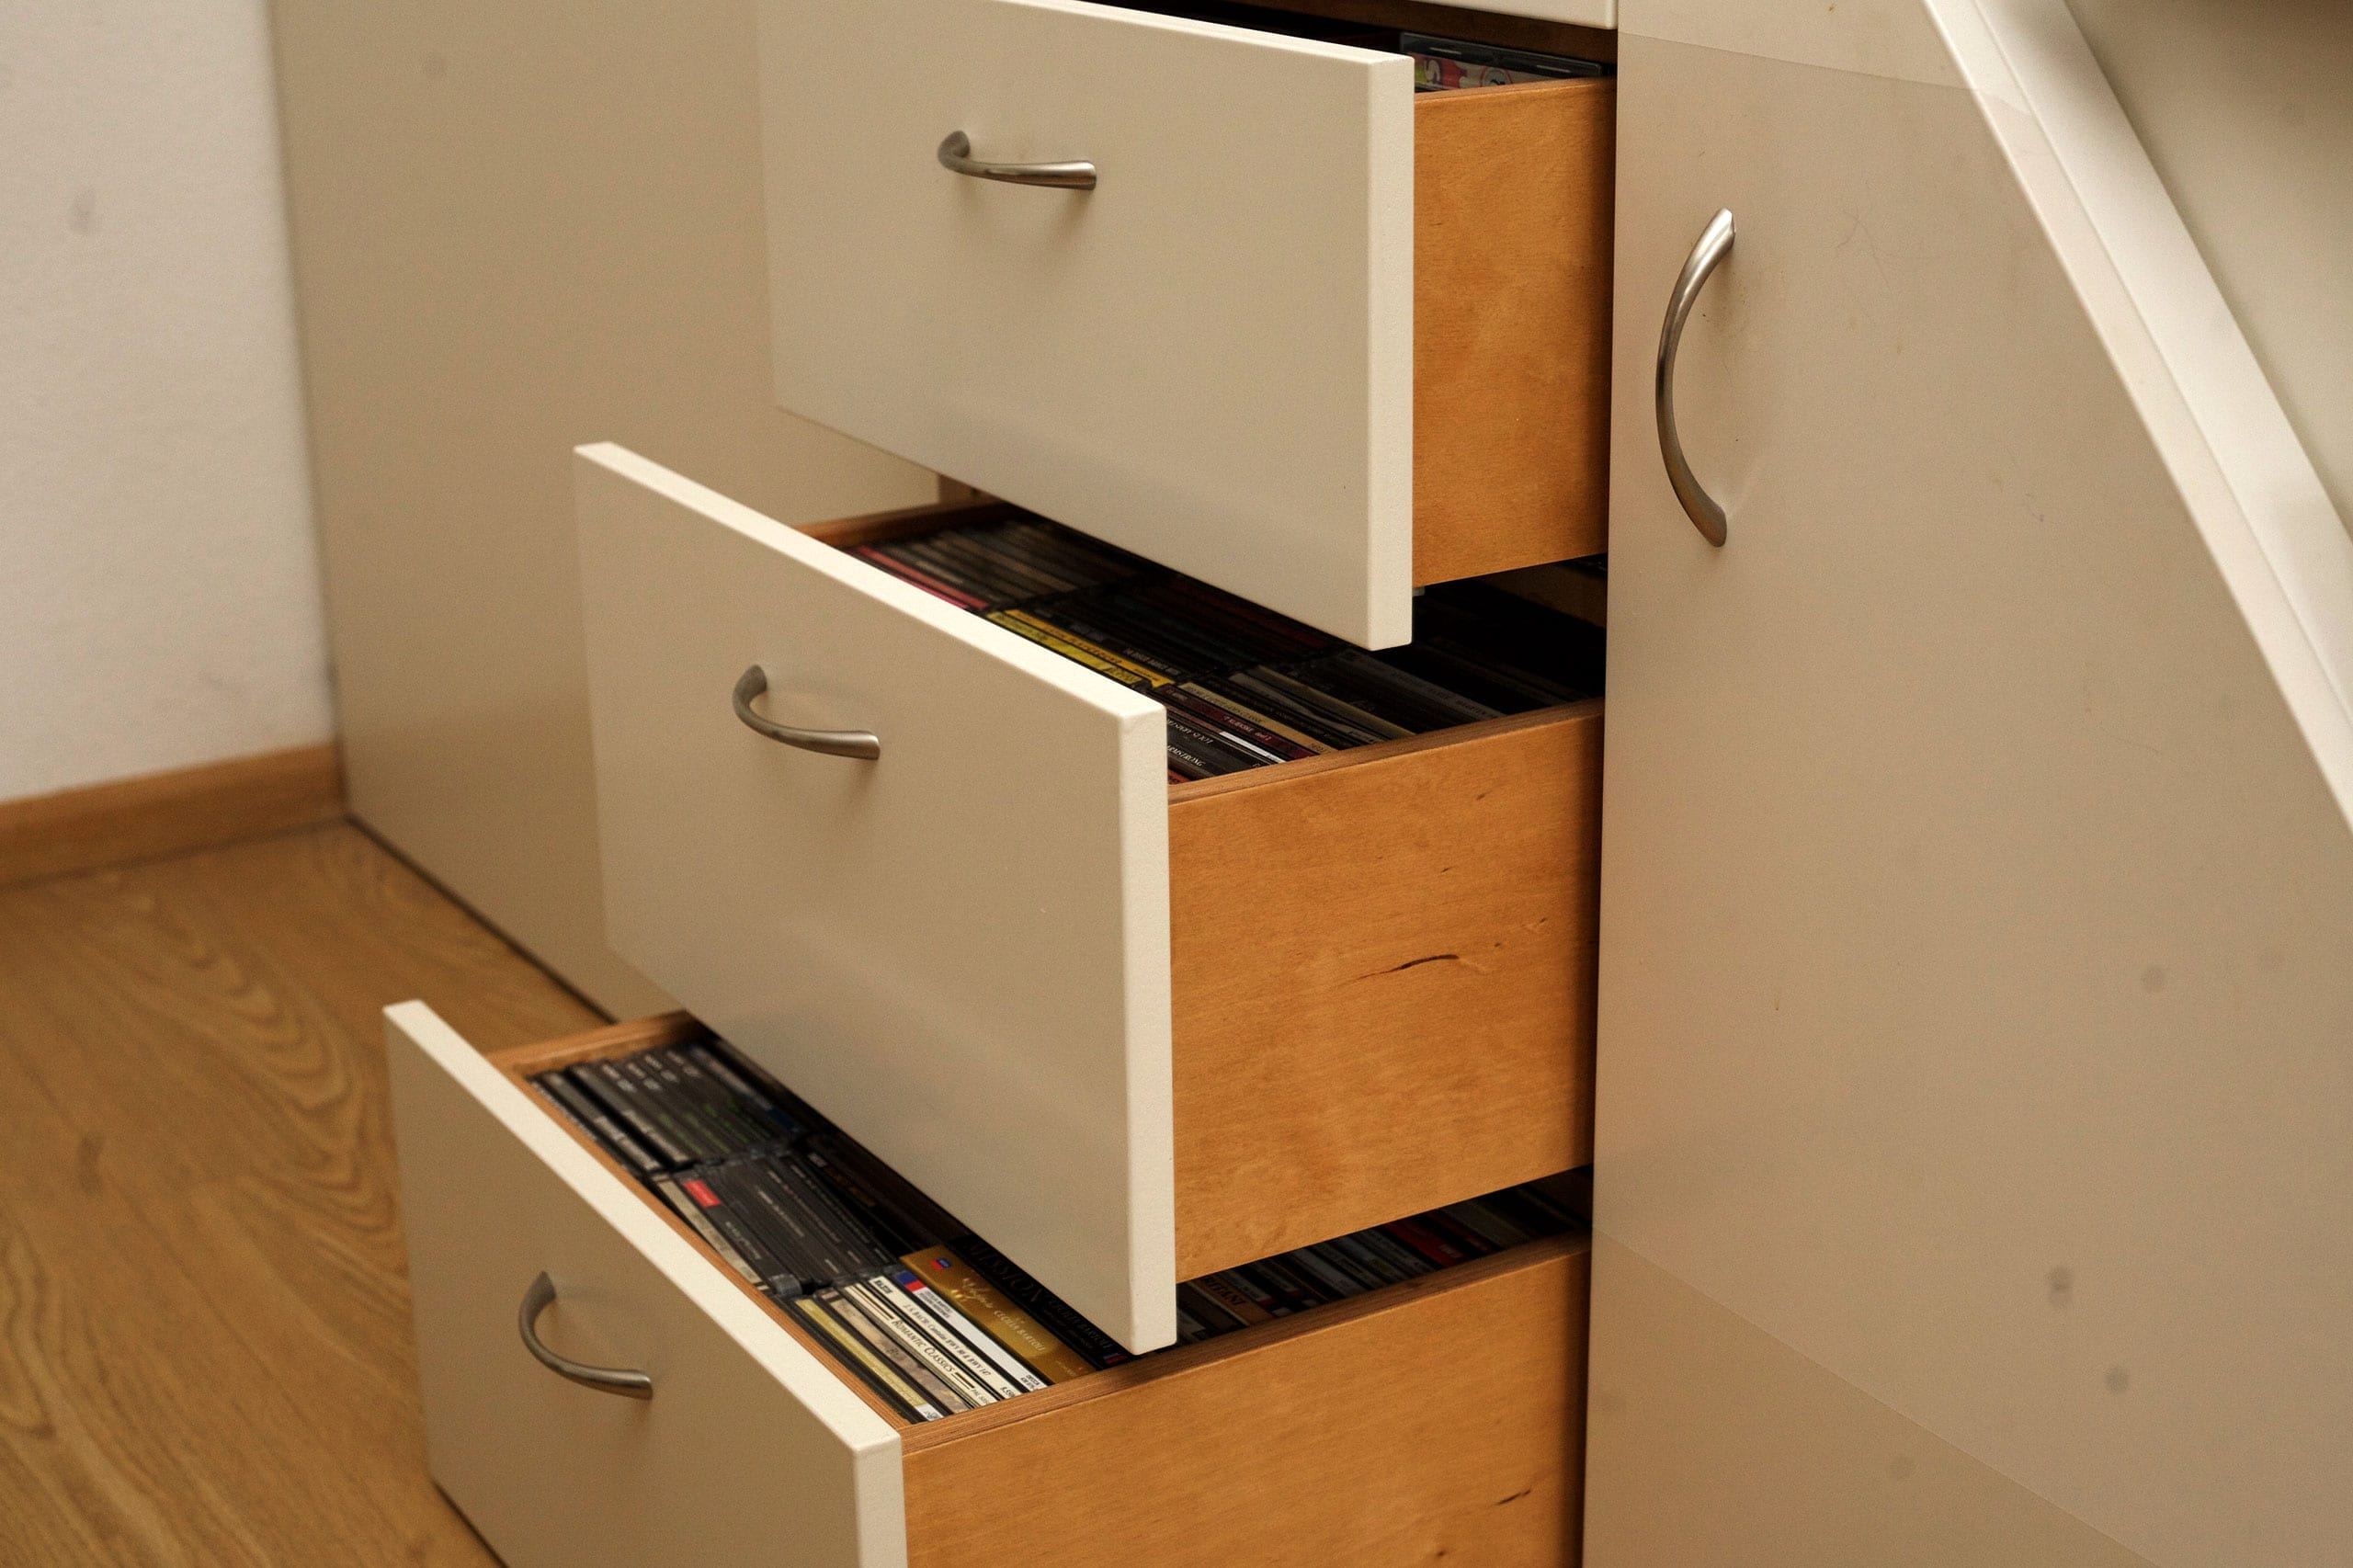 trapkast-ontwerp-op-maat-2